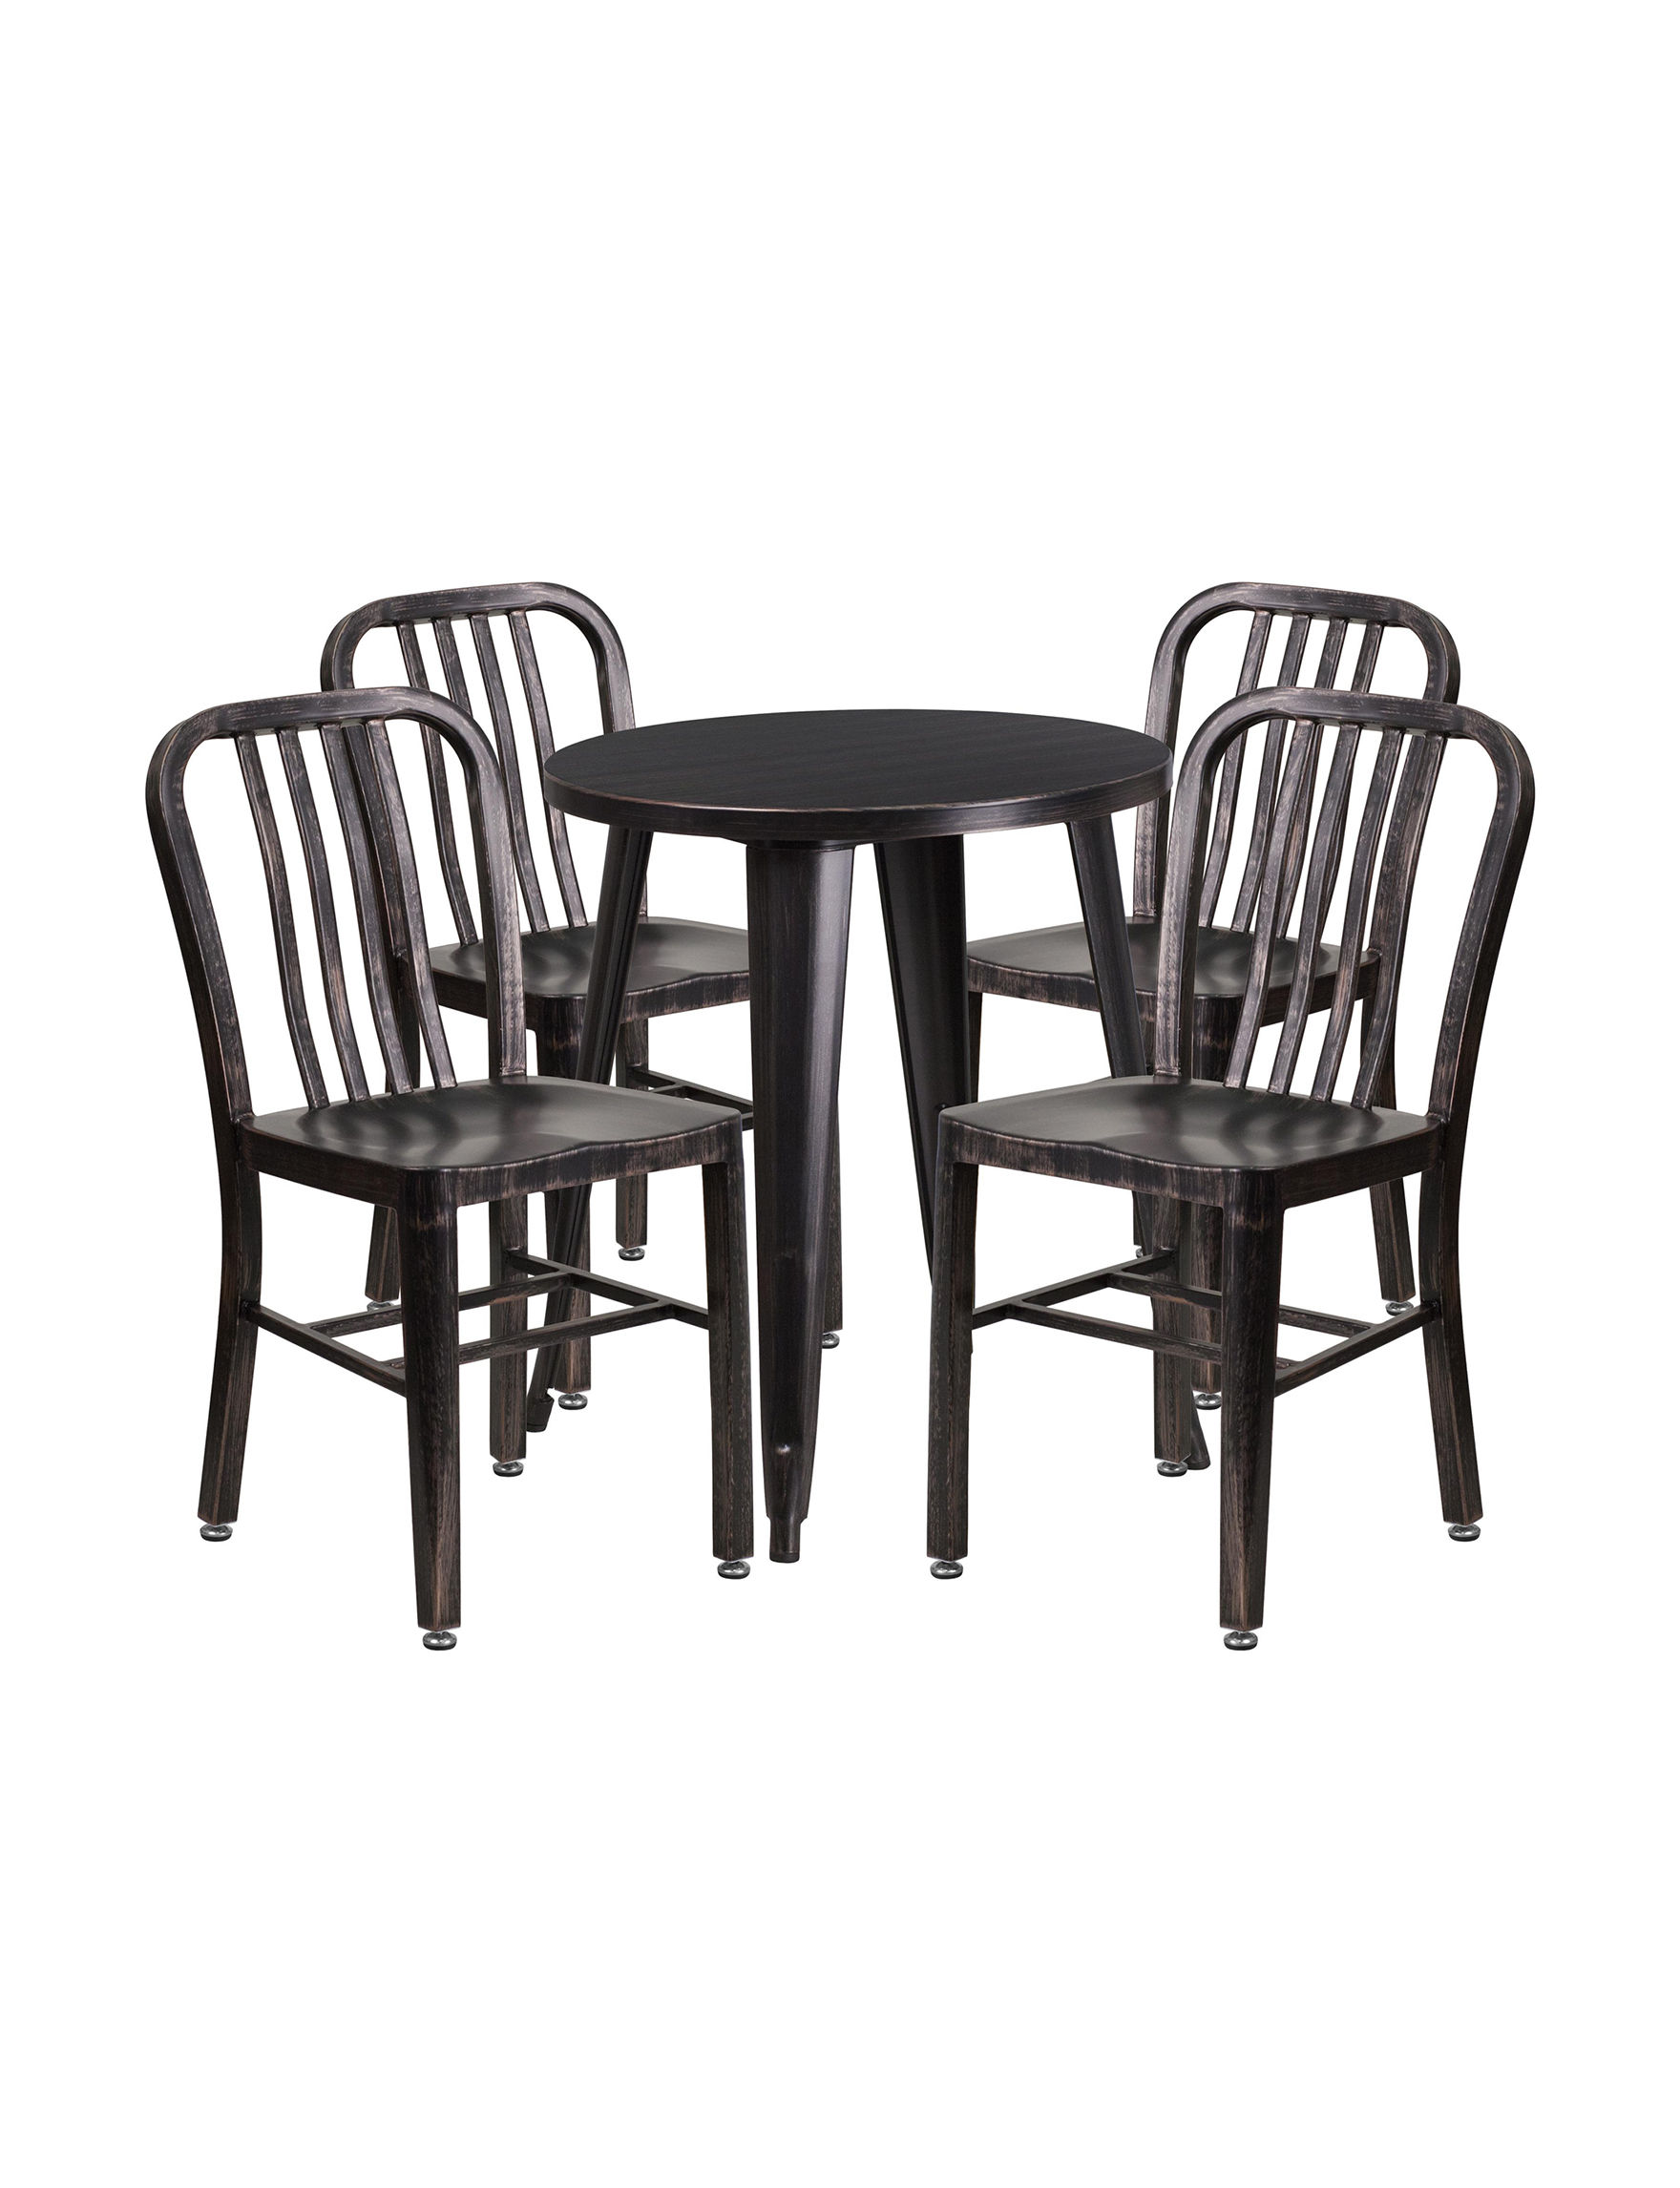 Flash Furniture Black / Gold Kitchen & Dining Furniture Outdoor Decor Outdoor Entertaining Patio & Outdoor Furniture